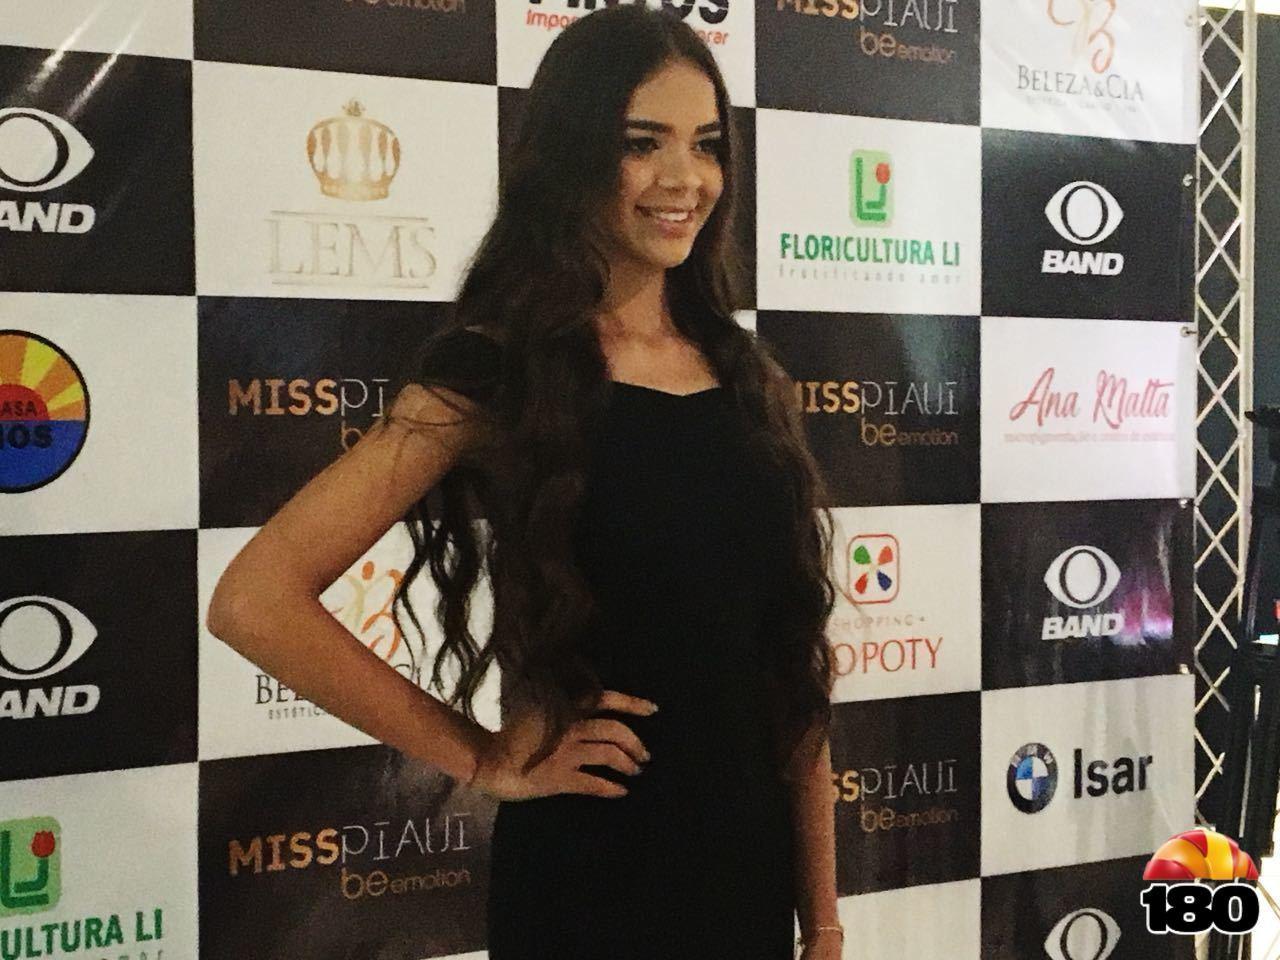 Estudante Junielle Fraenkelle Silva Santos, 19 anos